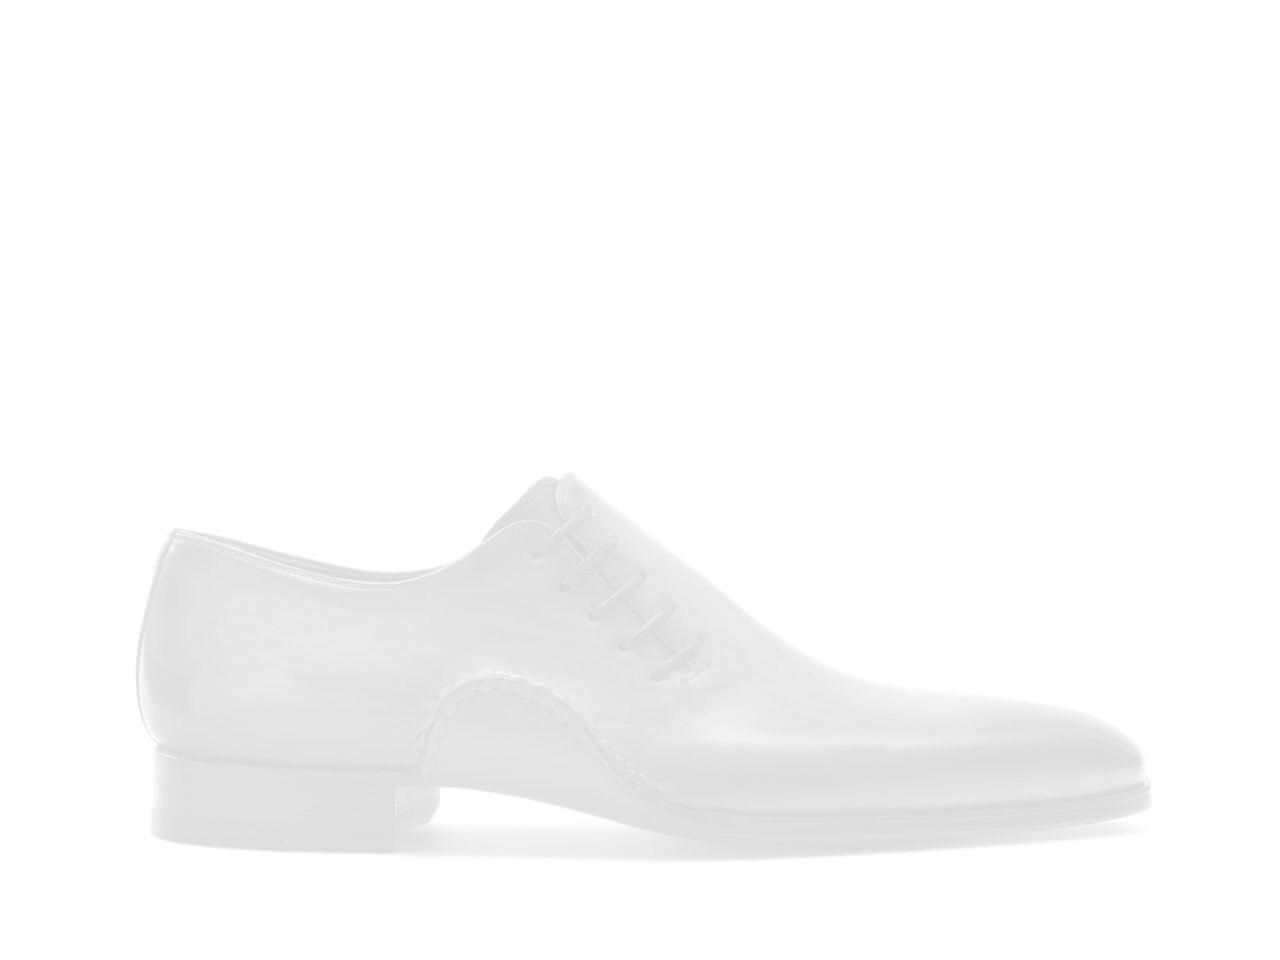 Pair of the Magnanni Aranga Grafito Men's Oxford Shoes